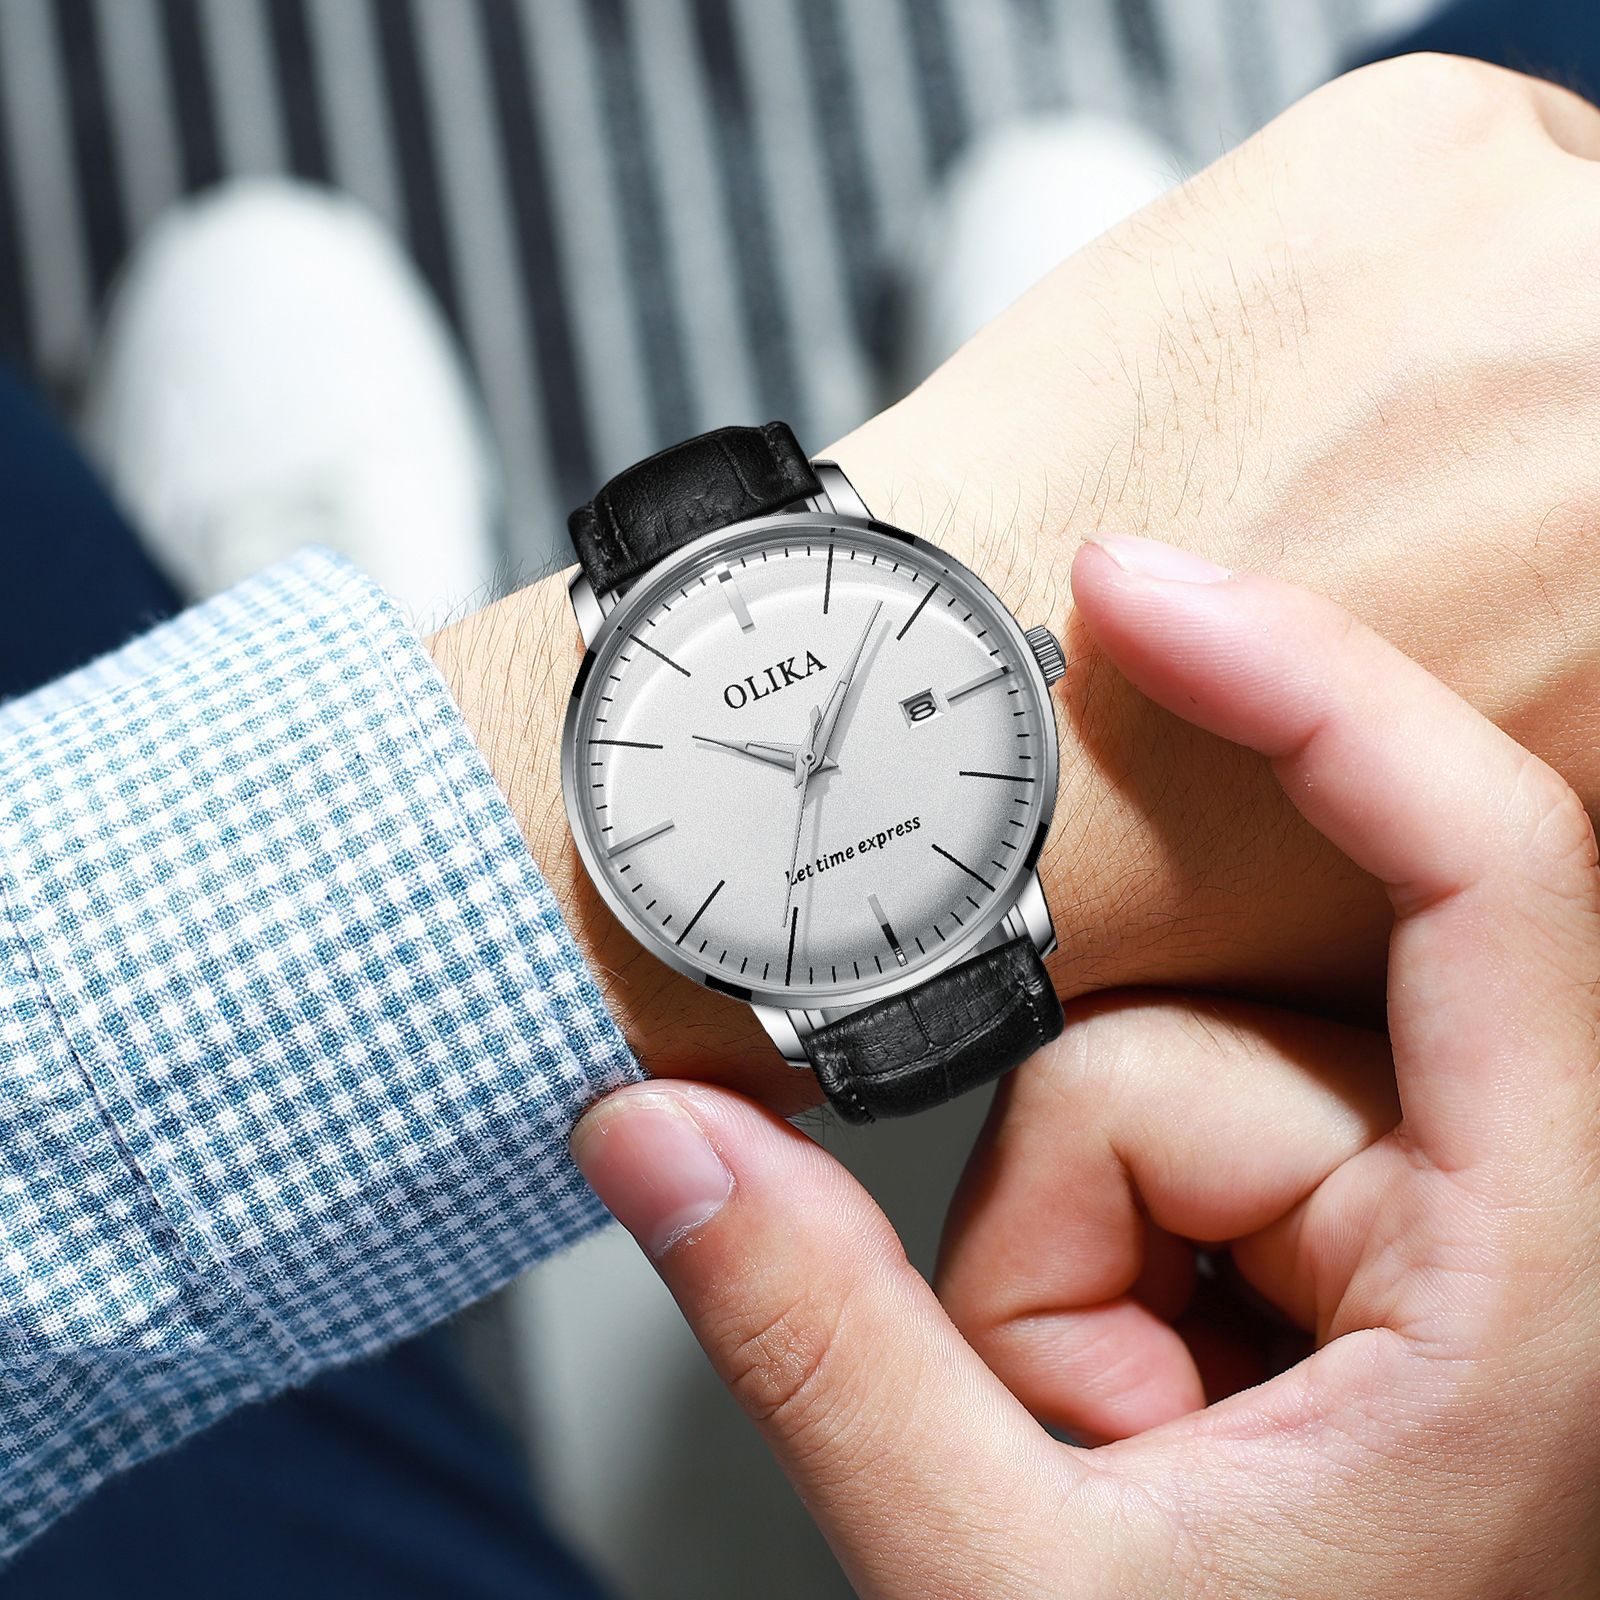 Swiss watch brand men's waterproof not mechanical automatic arc quartz watch men's sport man gift watches enlarge